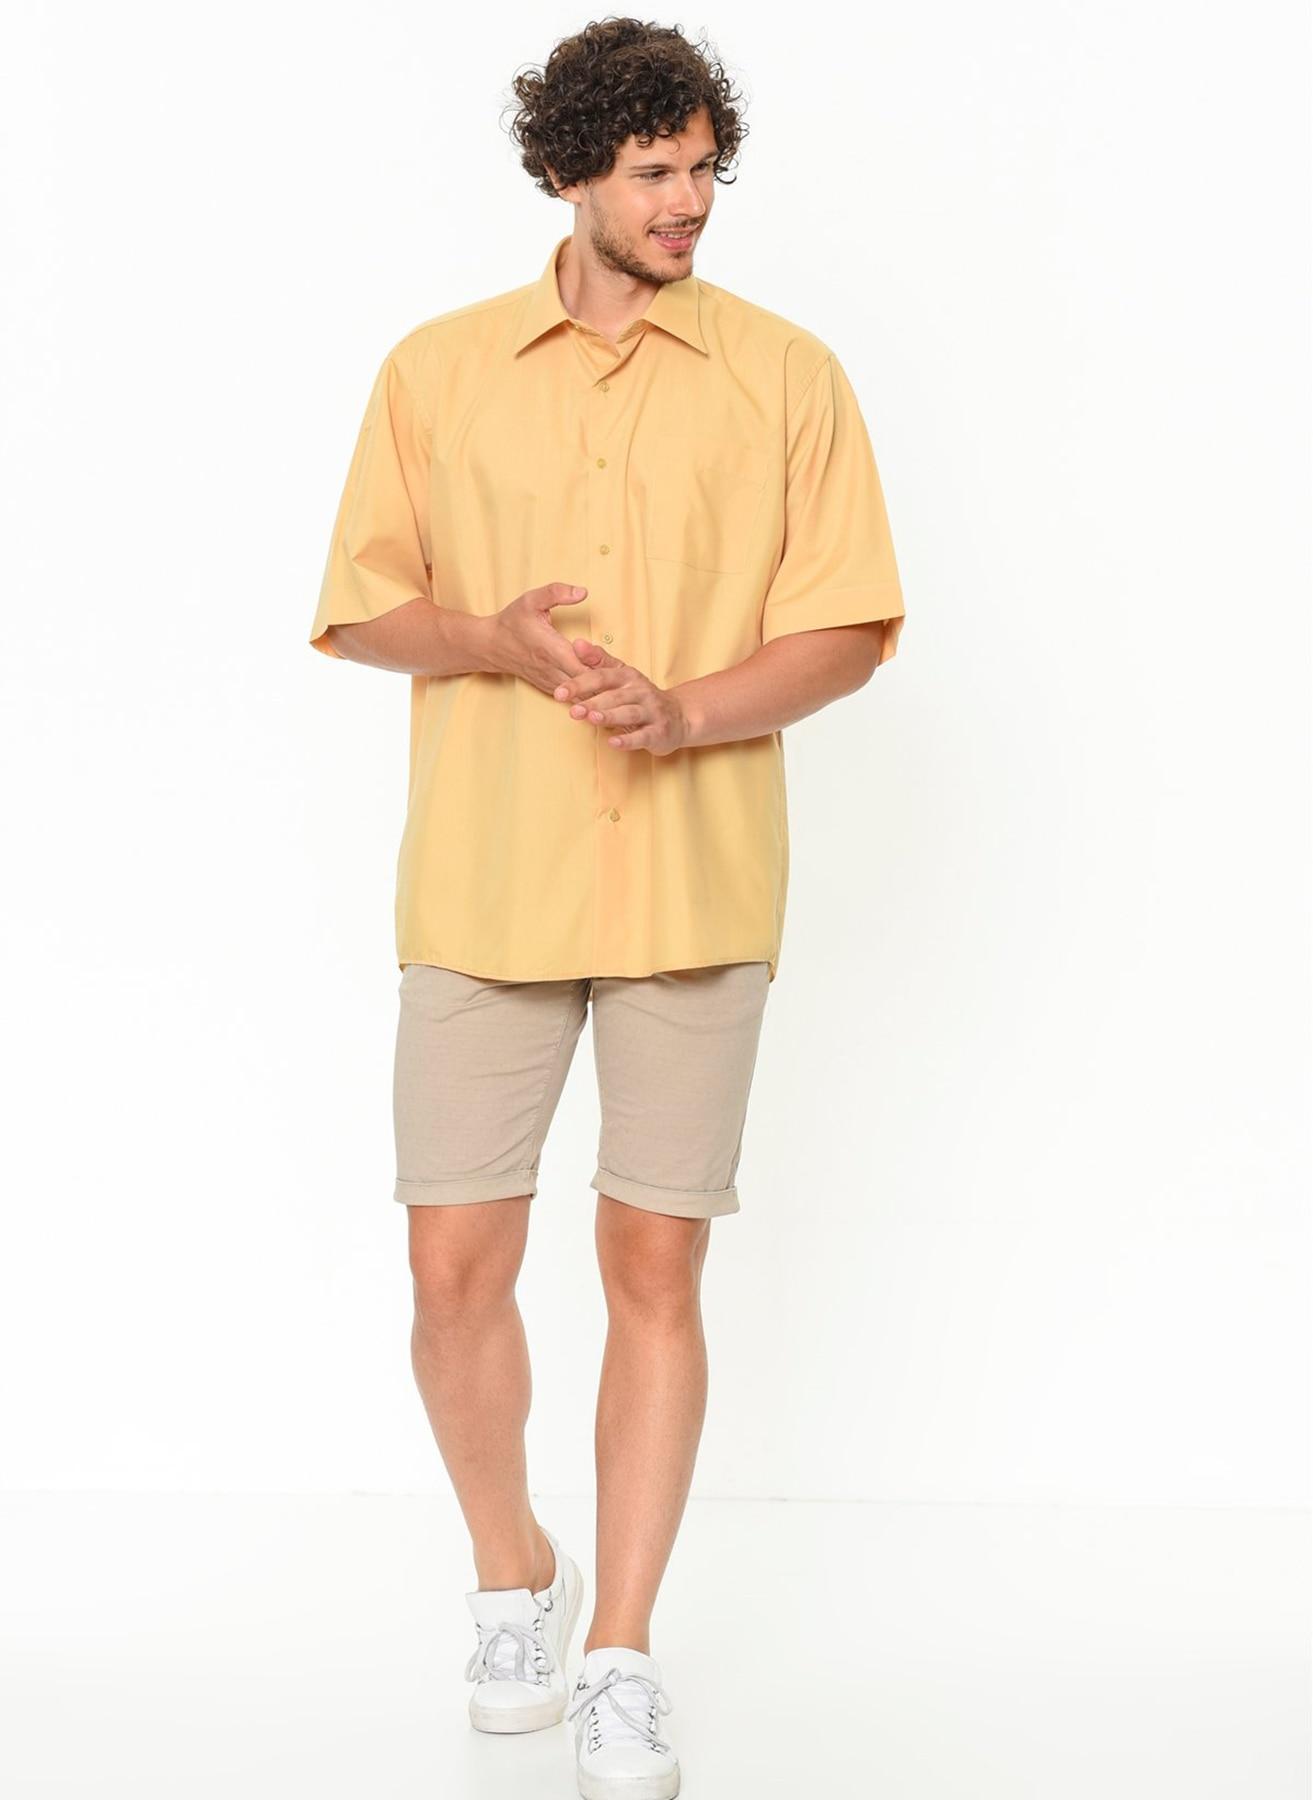 Plus Size Varetta men's shirt Casual Shirt Short Sleeve shirts for men Solid Yellow man shirts Big Size shirts for men Turkey